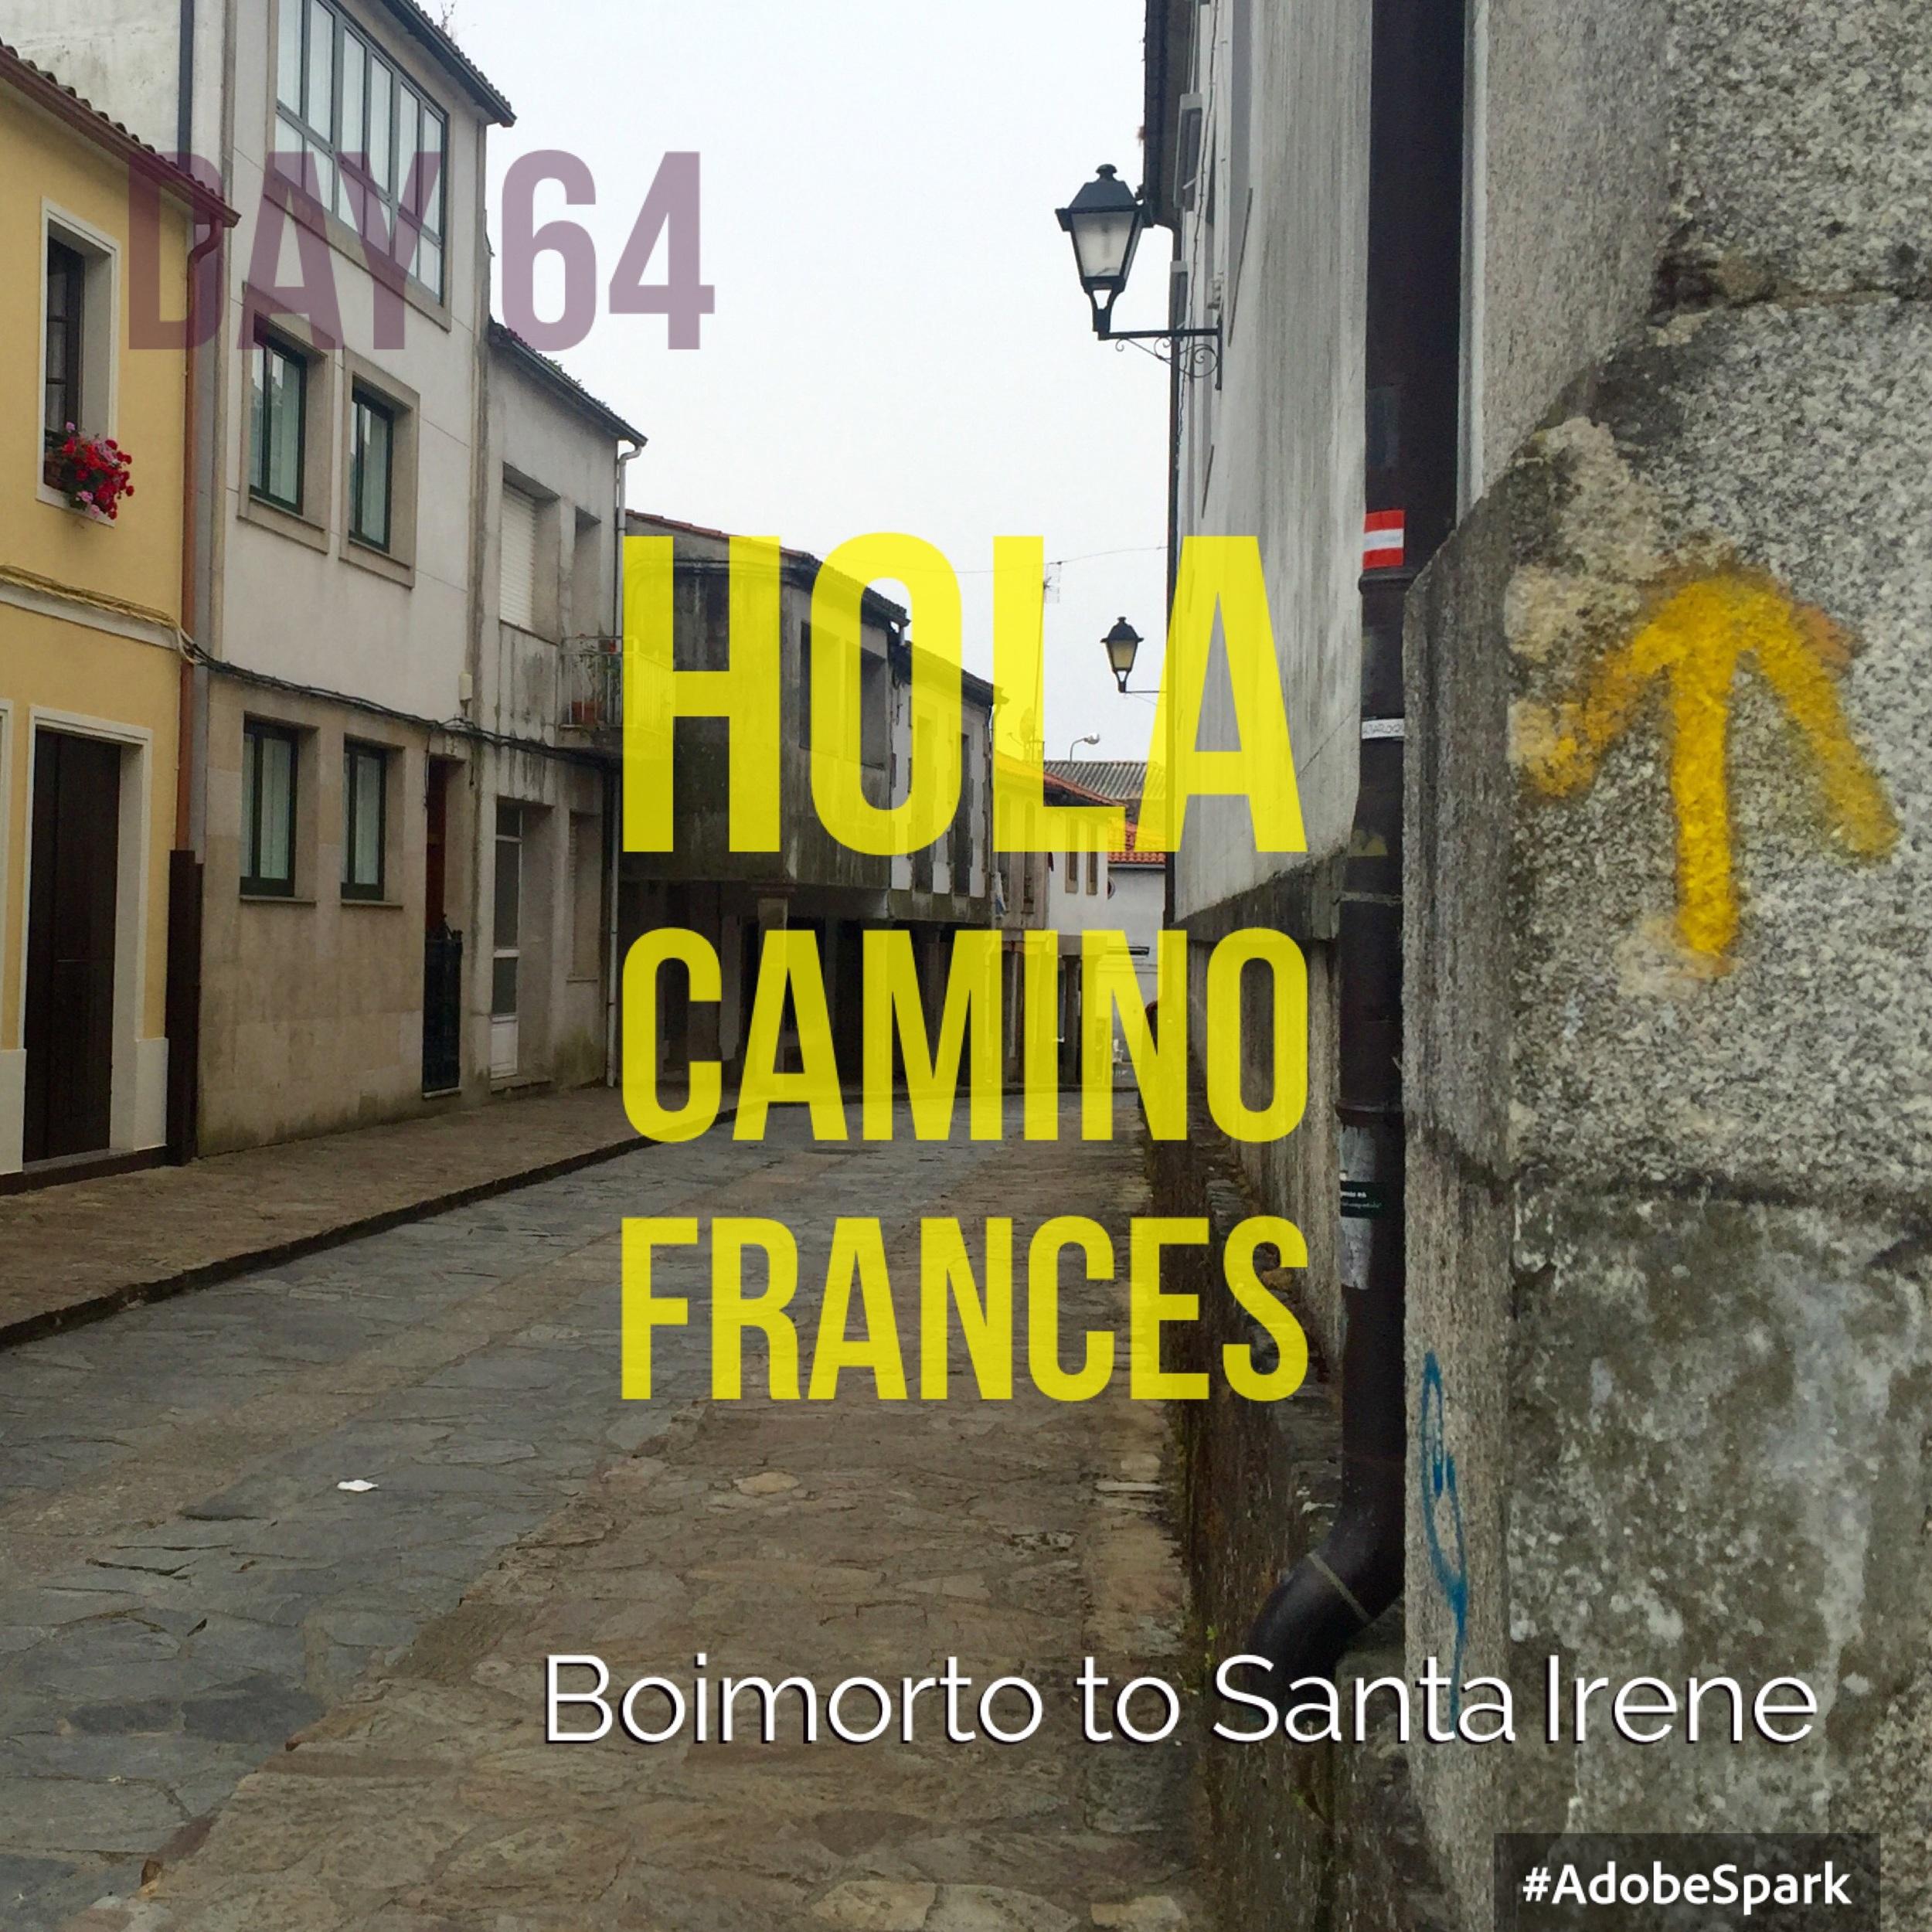 On to Santiago de Compostela